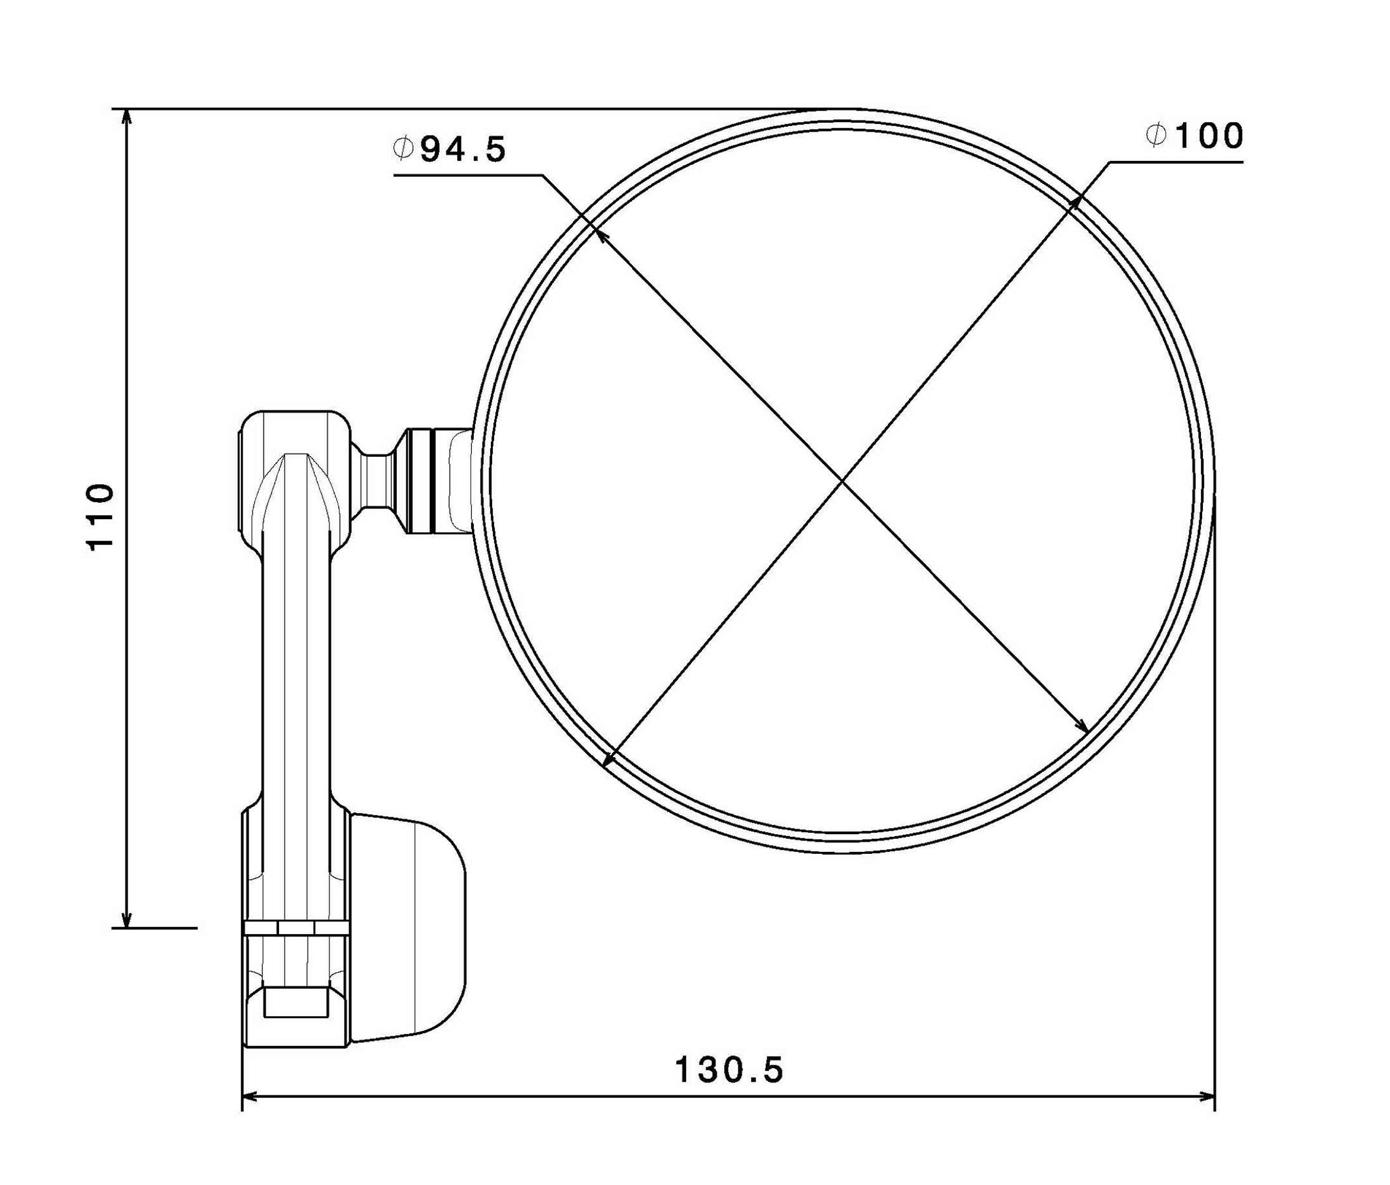 Rizoma Mirror Bs303b Tomtom Link 300 Wiring Diagram